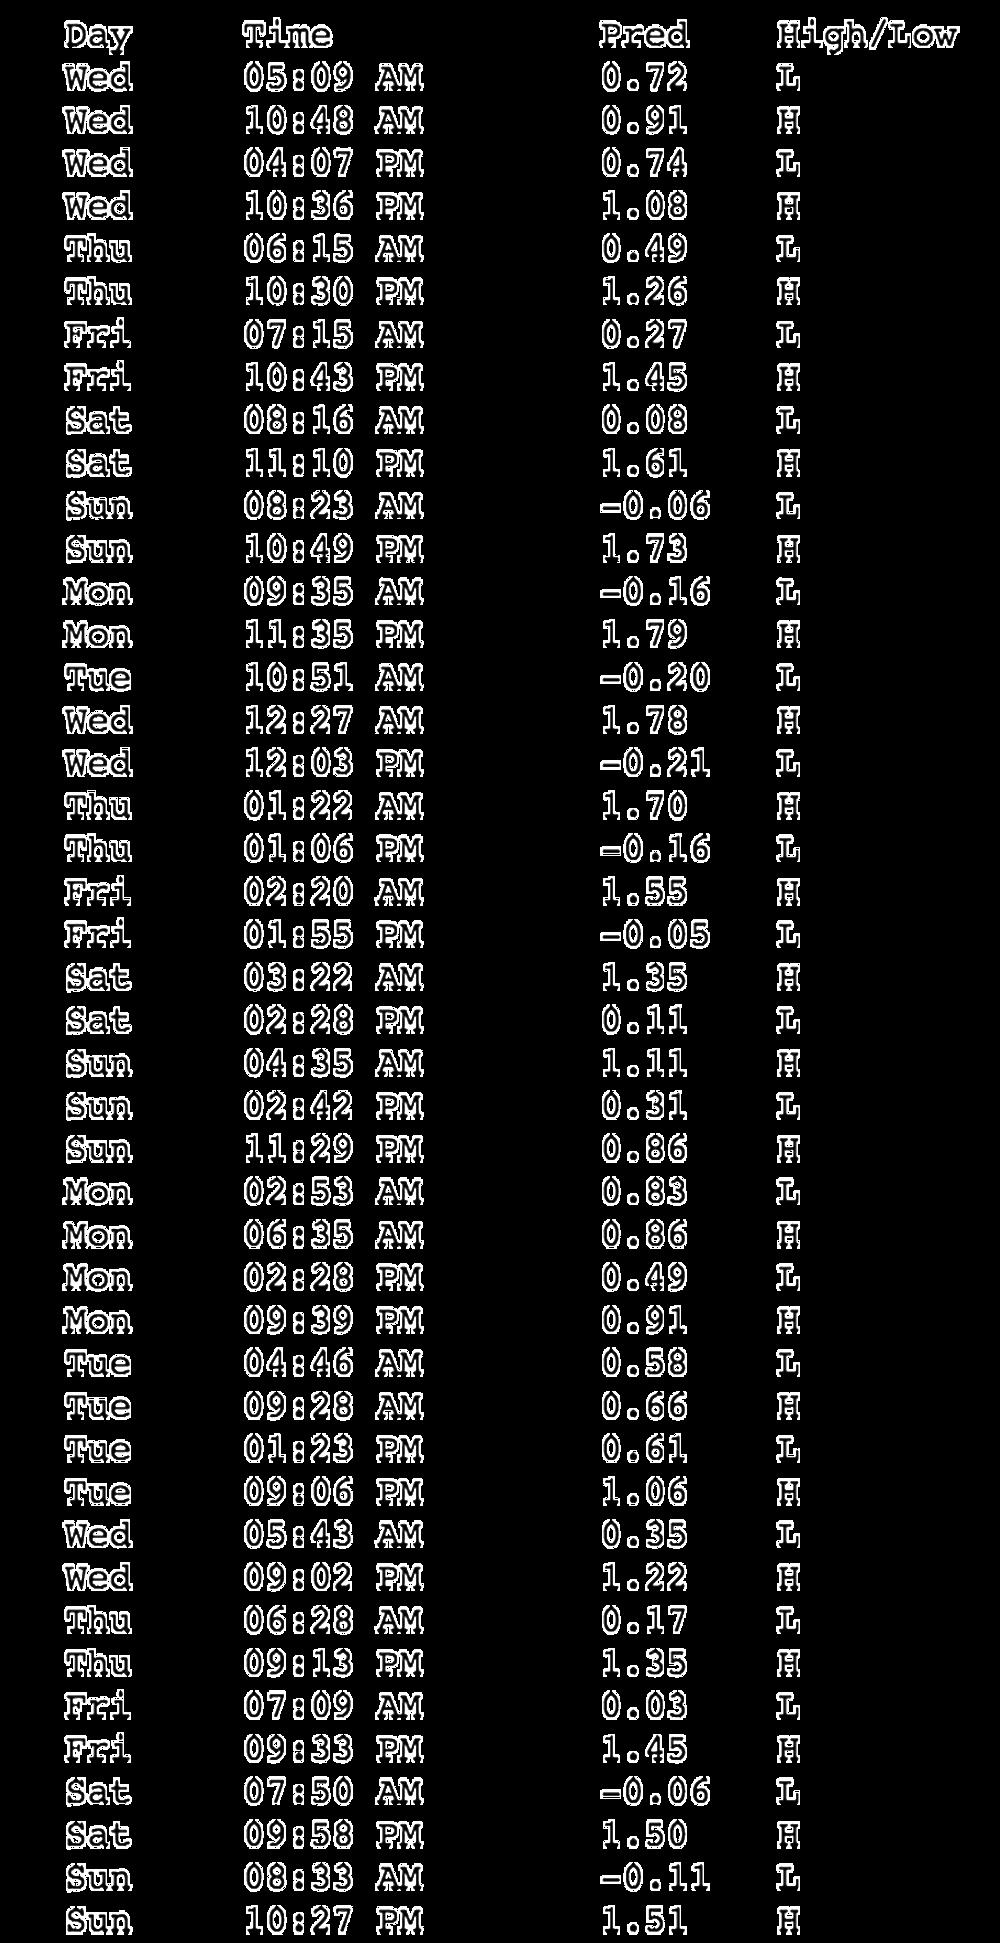 Screenshot 2017-12-20 17.23.13 copy.png